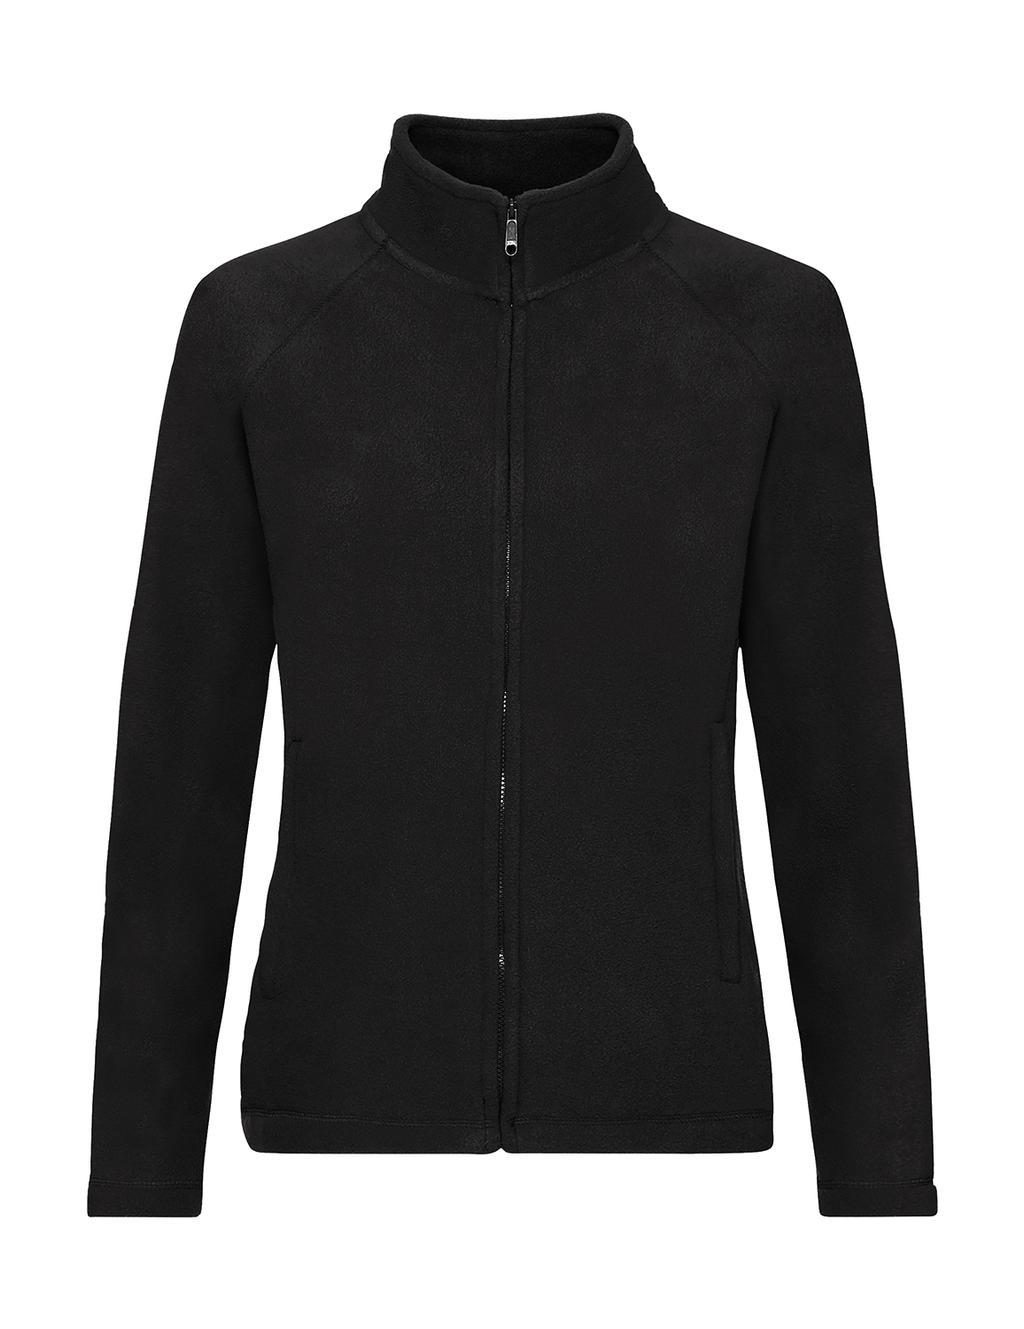 Dámská fleecová bunda Full Zip - zvìtšit obrázek